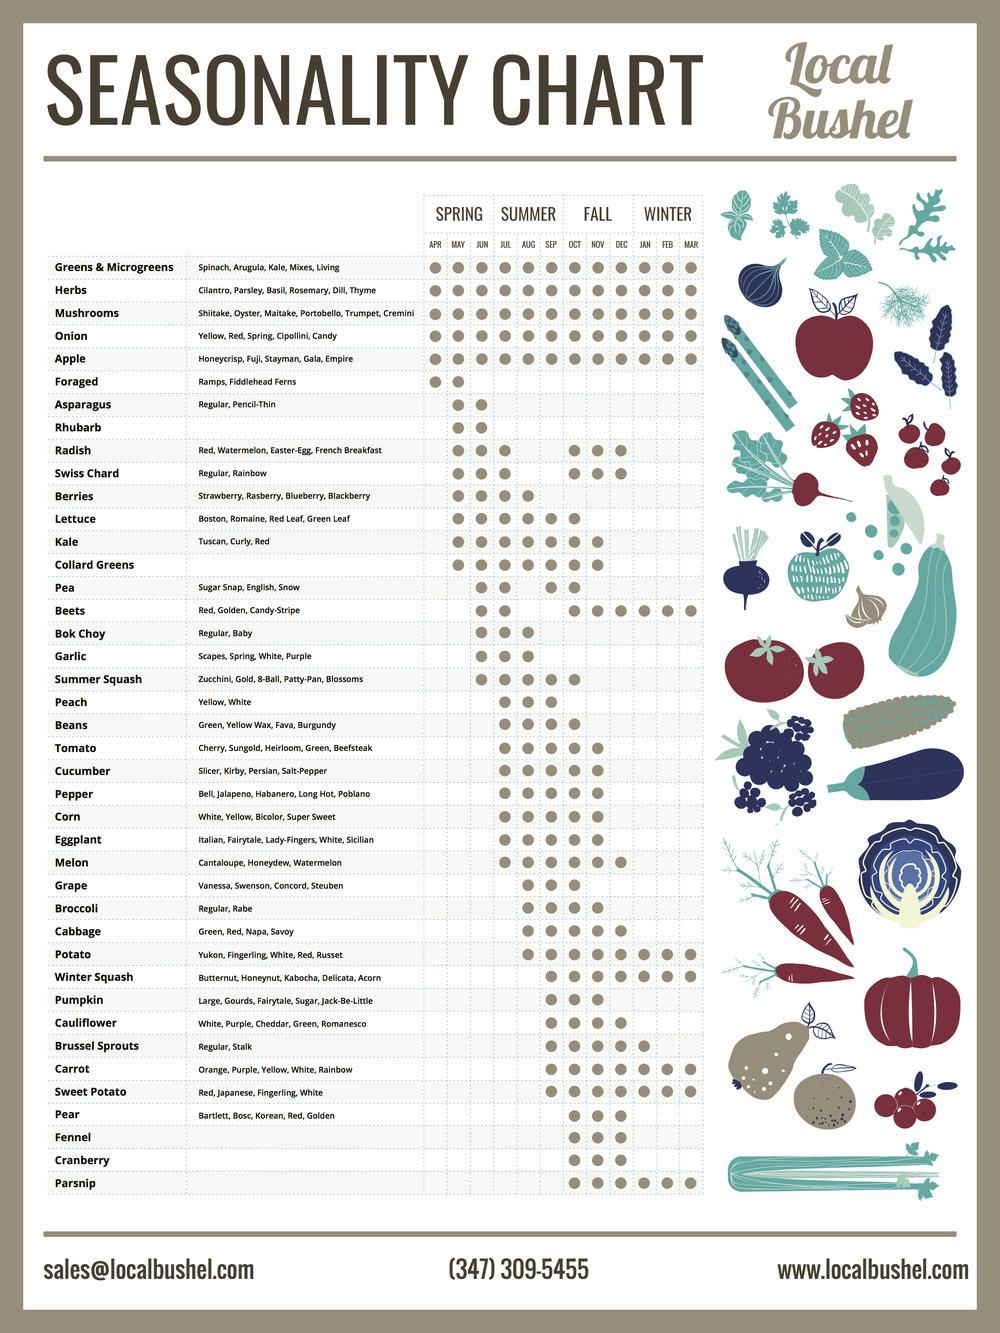 Local Bushel - Seasonality Chart.jpg